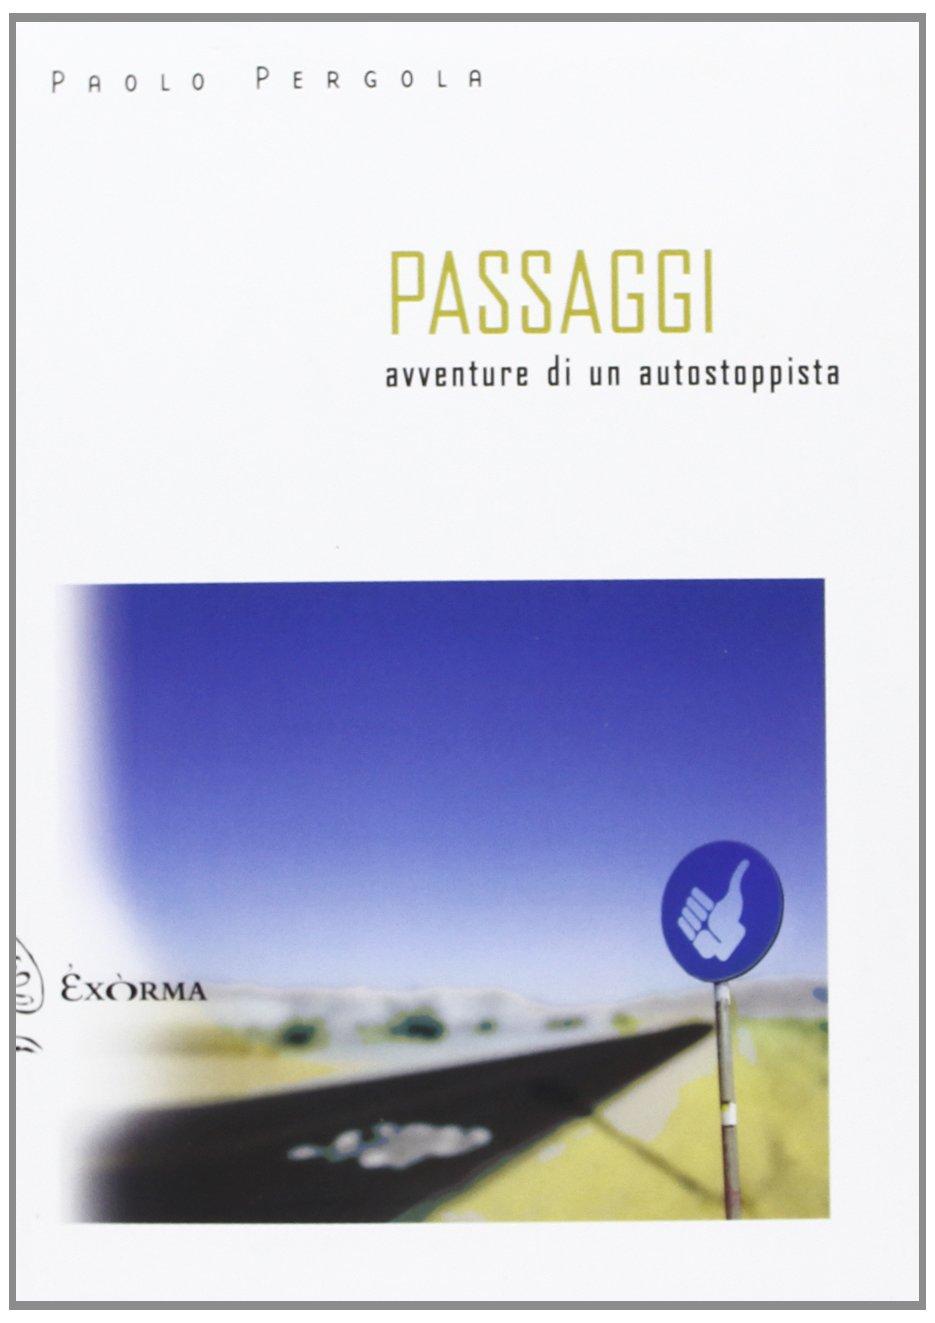 Passaggi. Avventure di un autostoppista Scritti traversi: Amazon.es: Pergola, Paolo: Libros en idiomas extranjeros